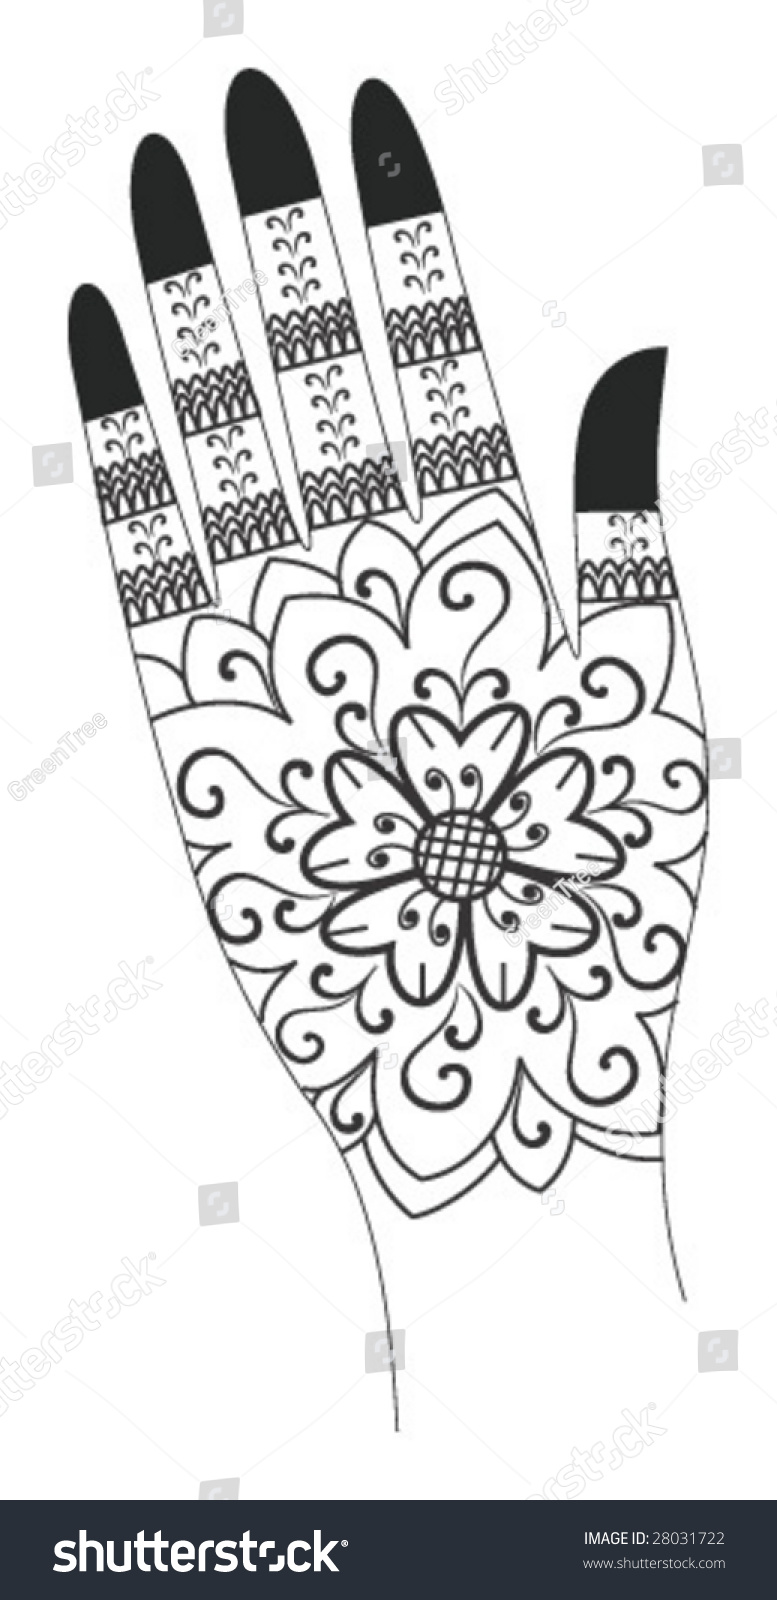 Mehndi Hands Clipart : Vector illustration of a henna tattoo artwork india